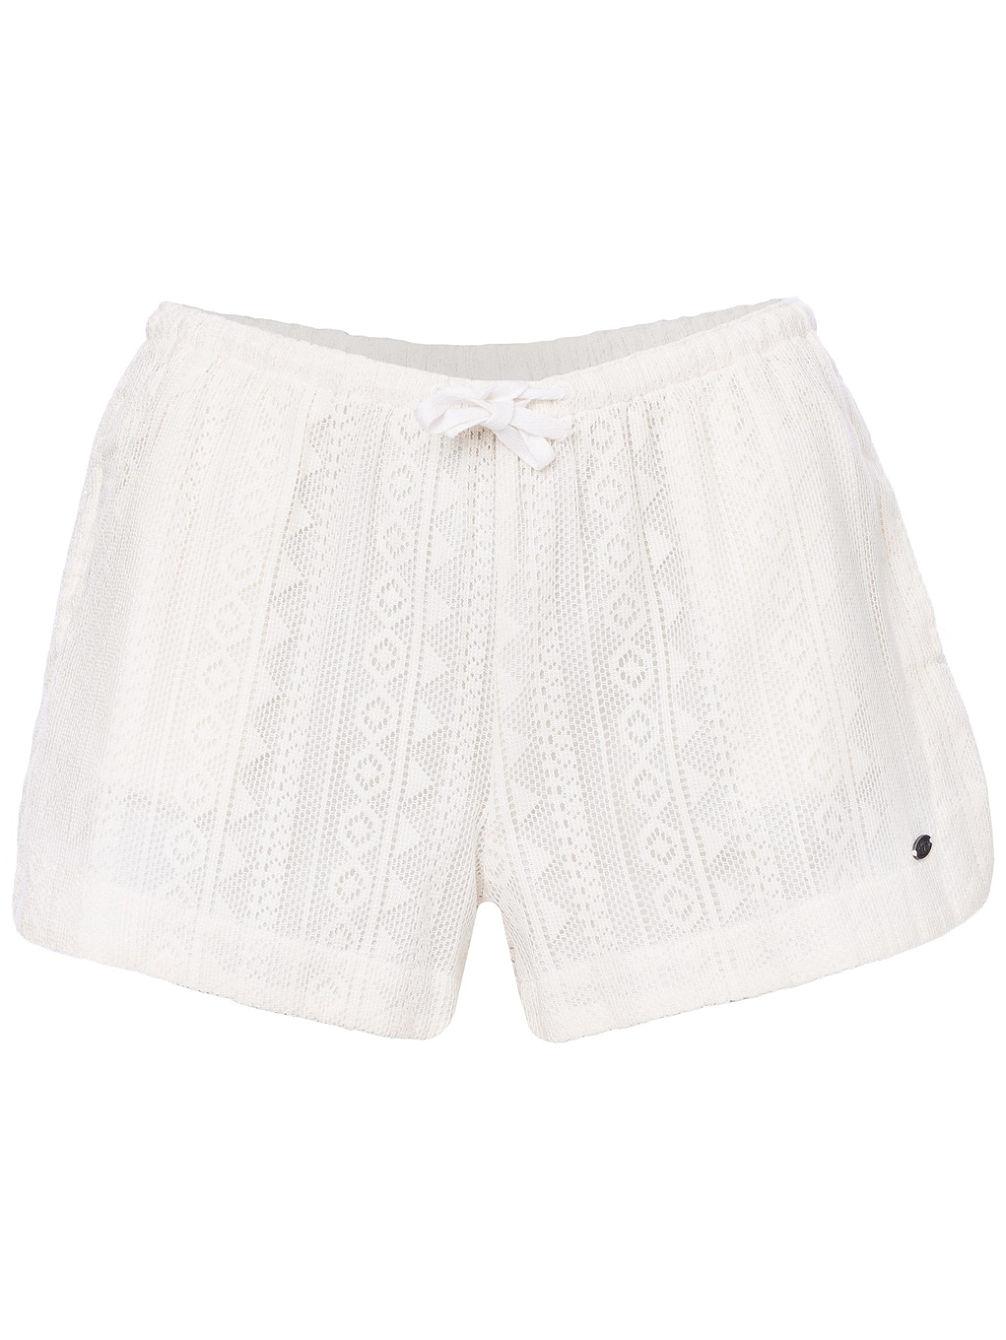 animal-indian-summer-shorts